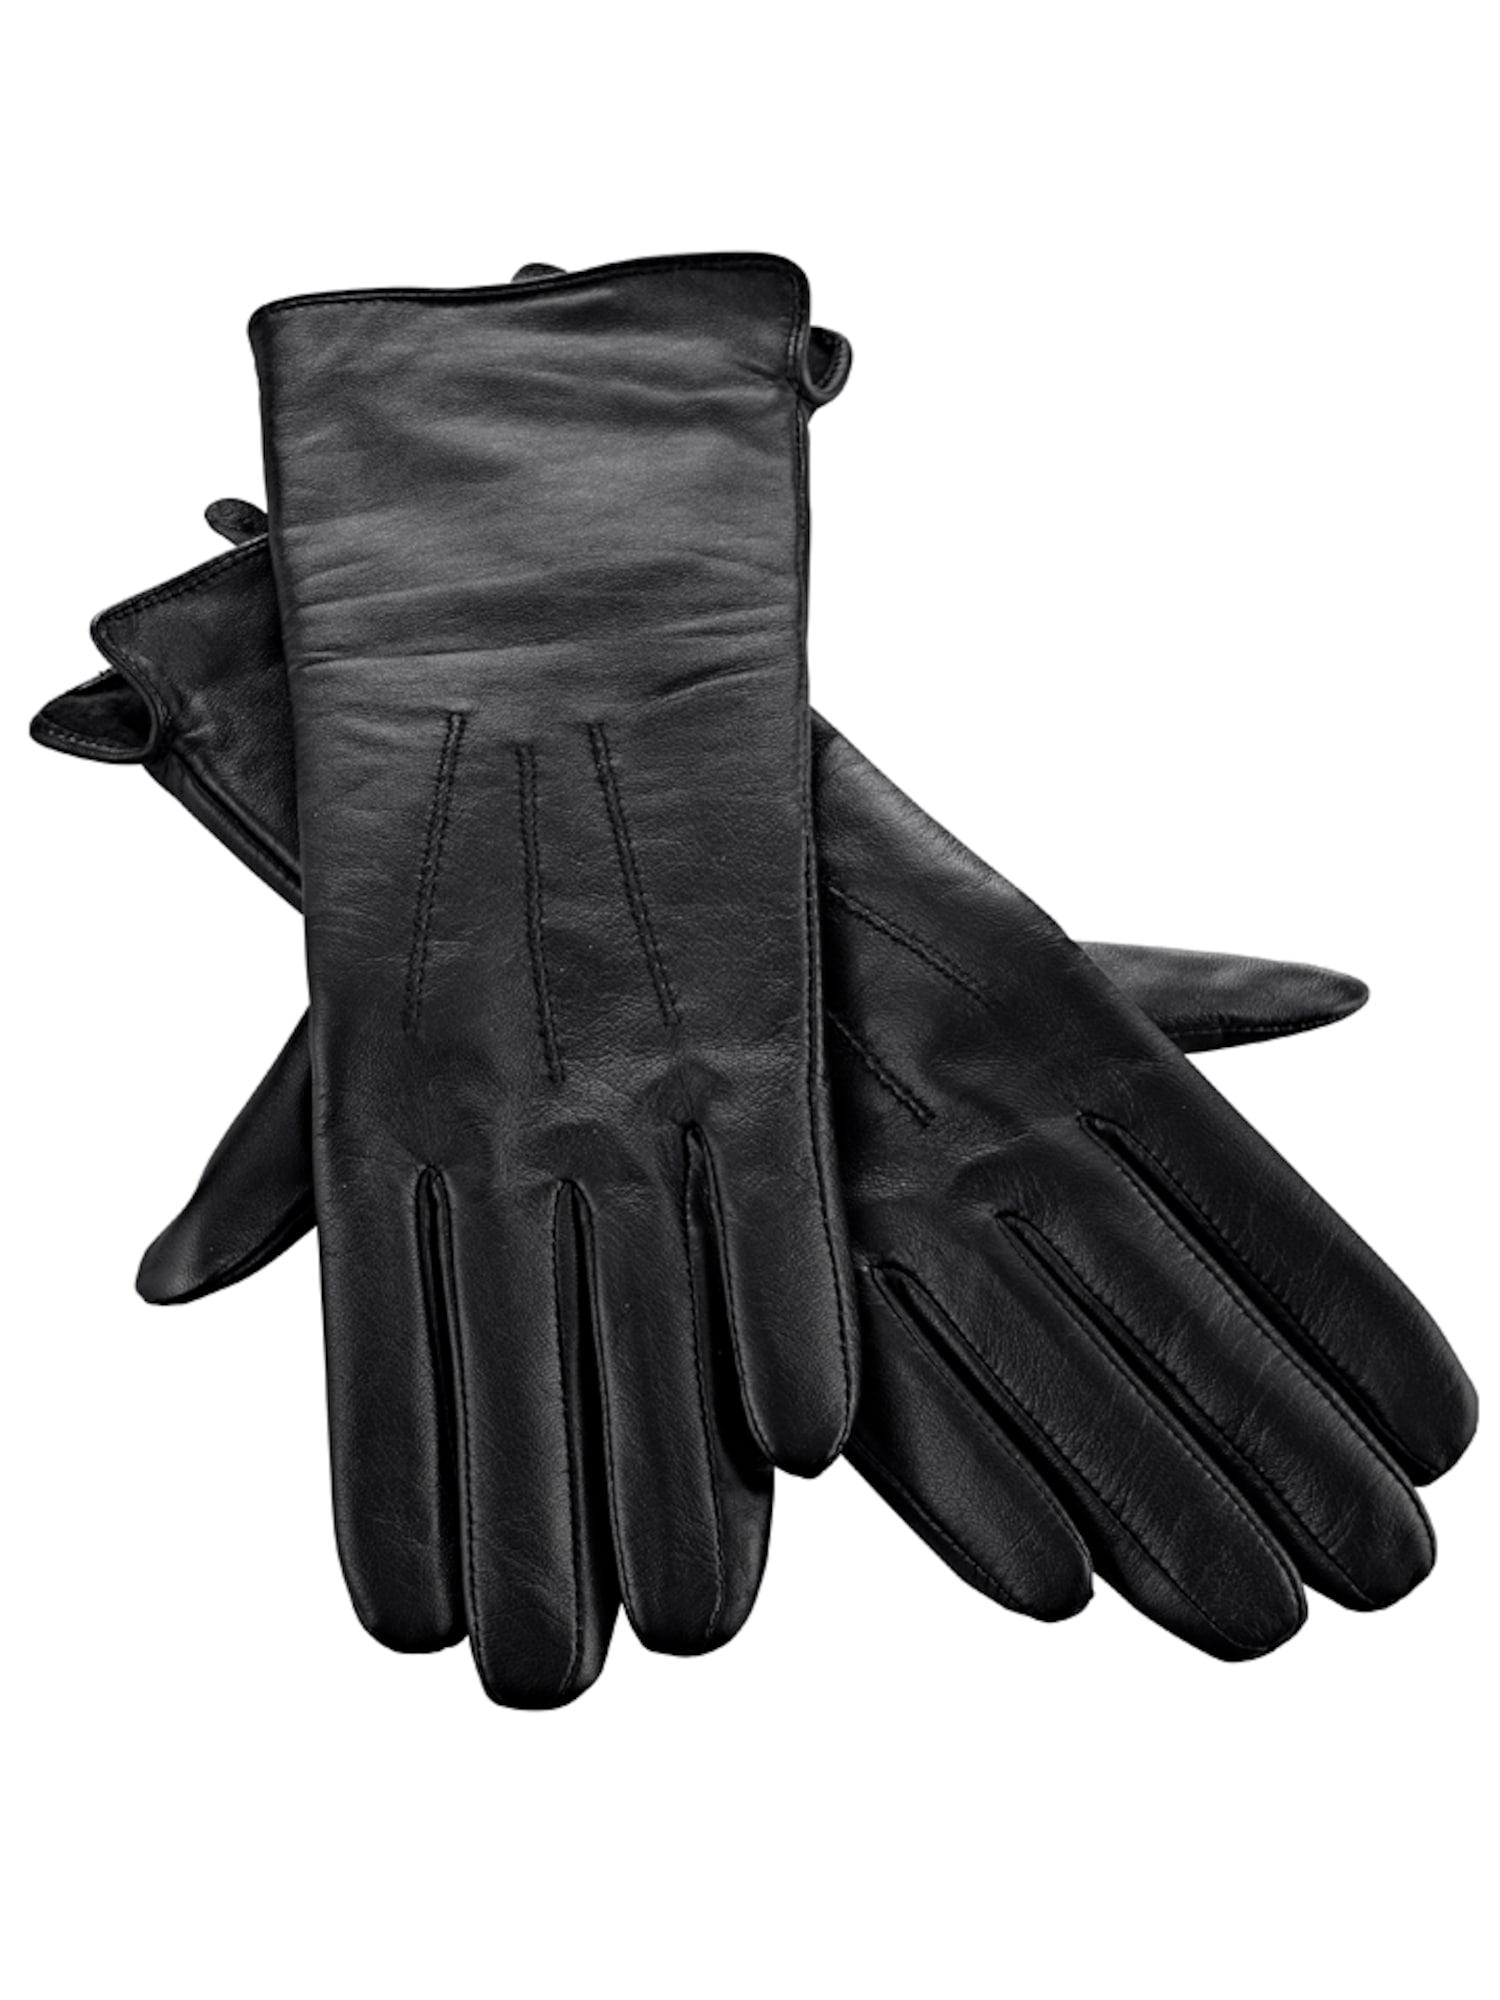 Handschuhe   Accessoires > Handschuhe > Sonstige Handschuhe   heine